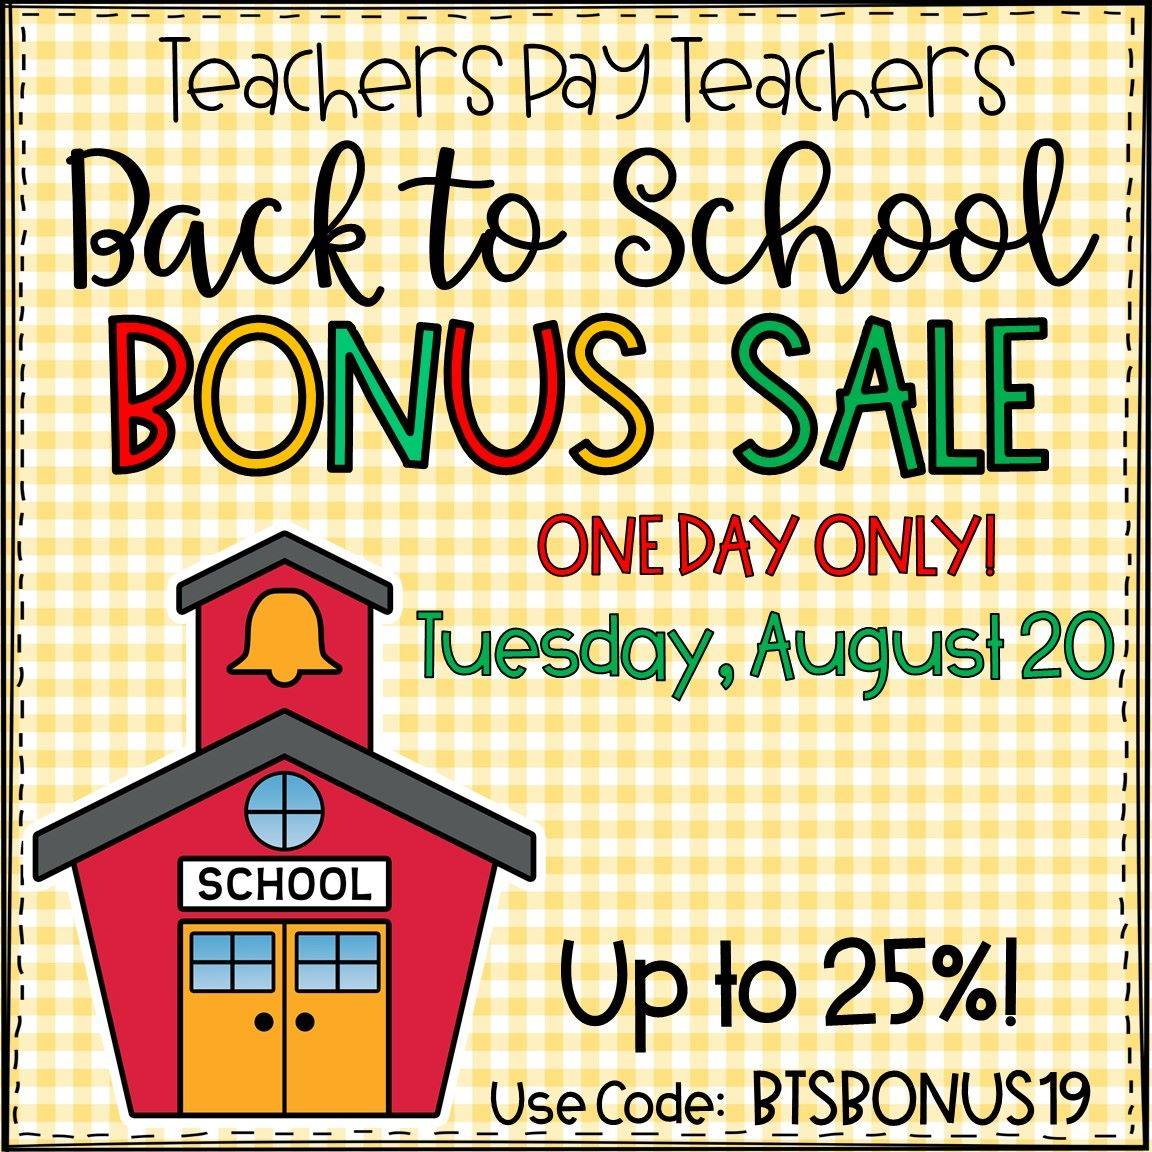 Save big during the TPT Bonus Sale on 8/20/19 with code BTSBONUS19! | The ESL Nexus